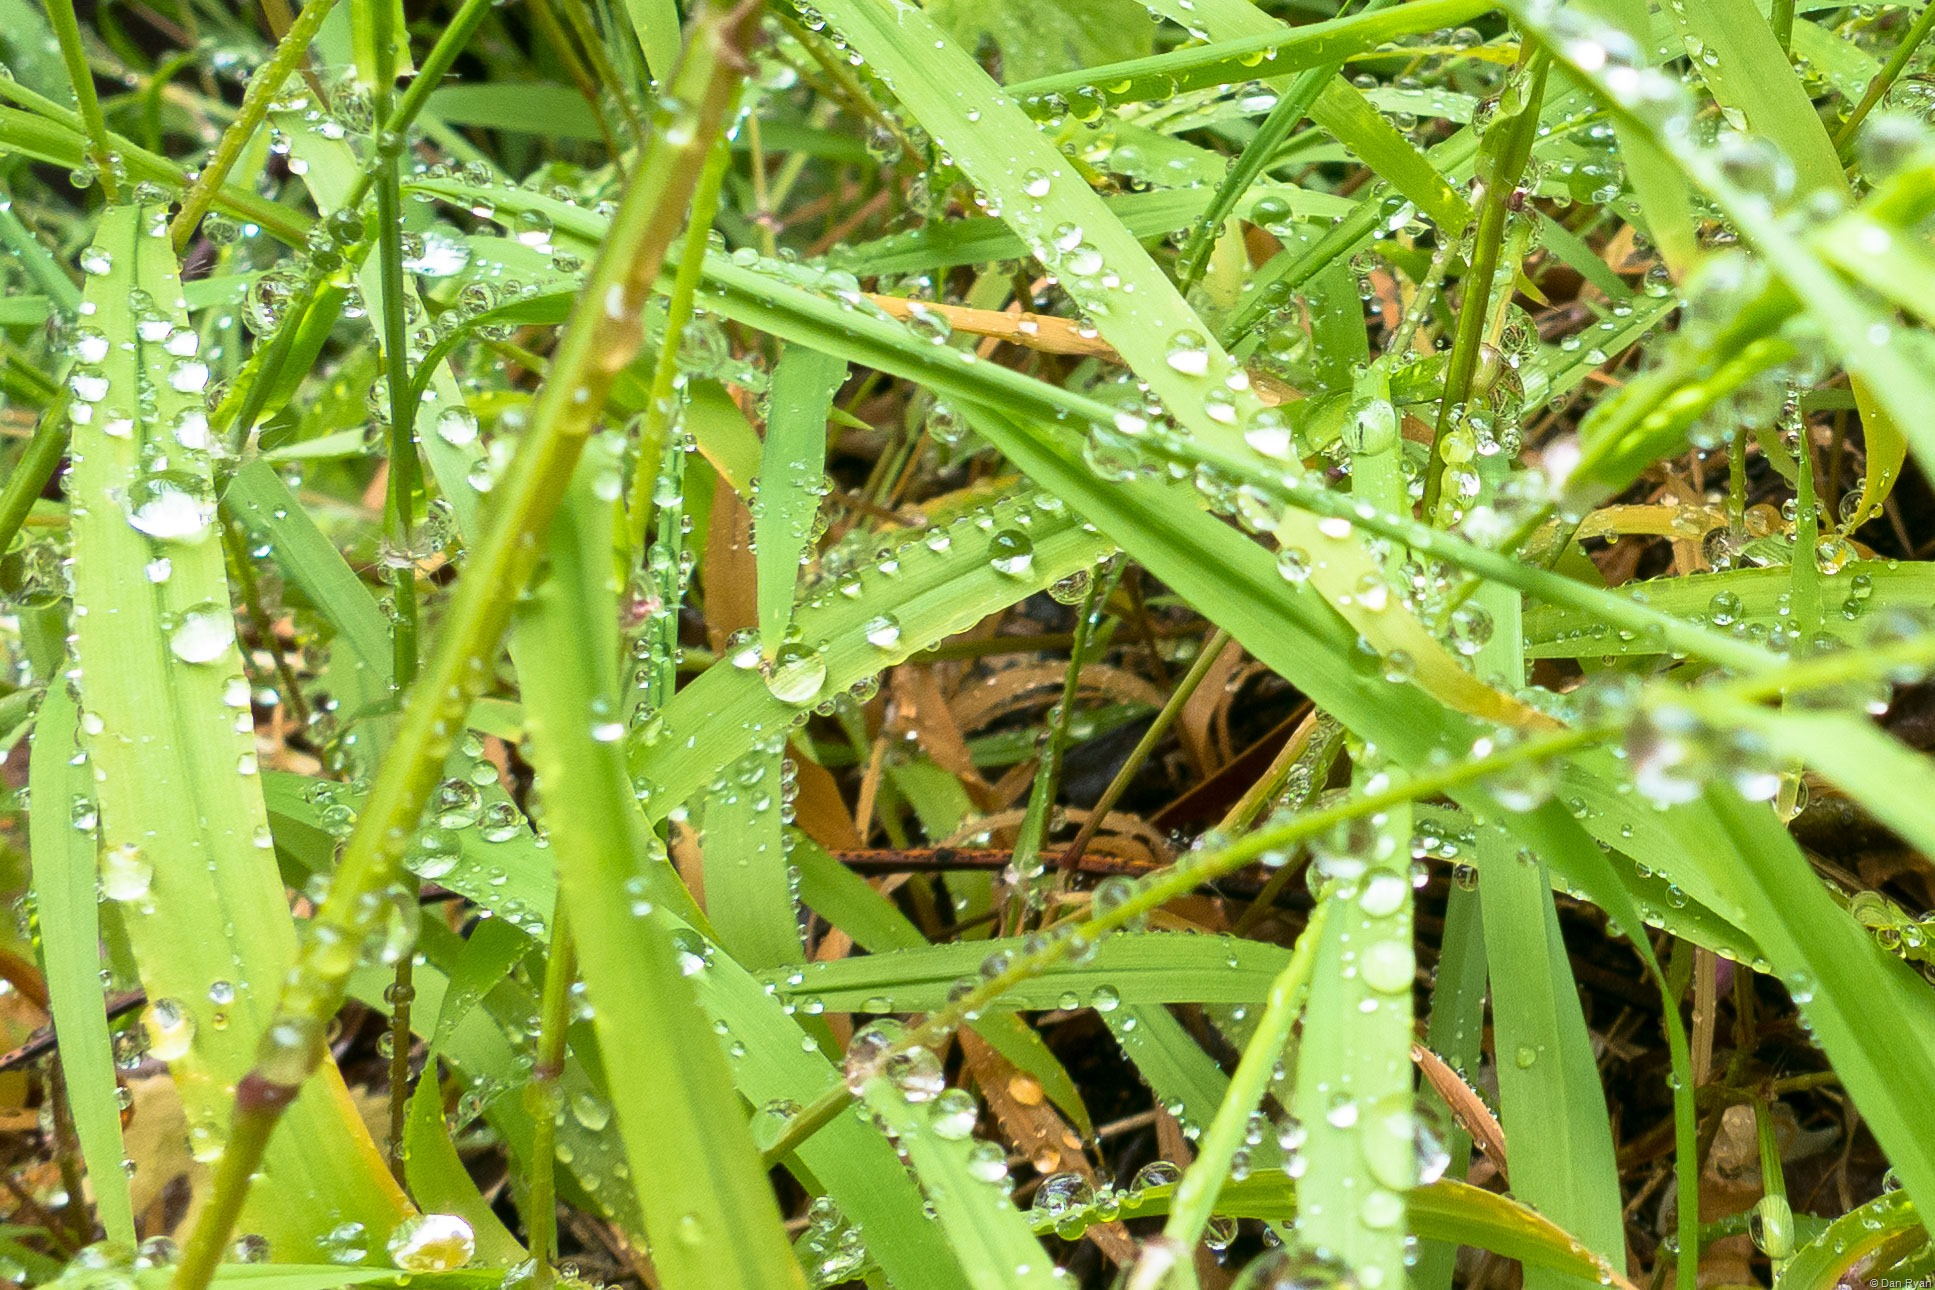 raindrops on blades of grass